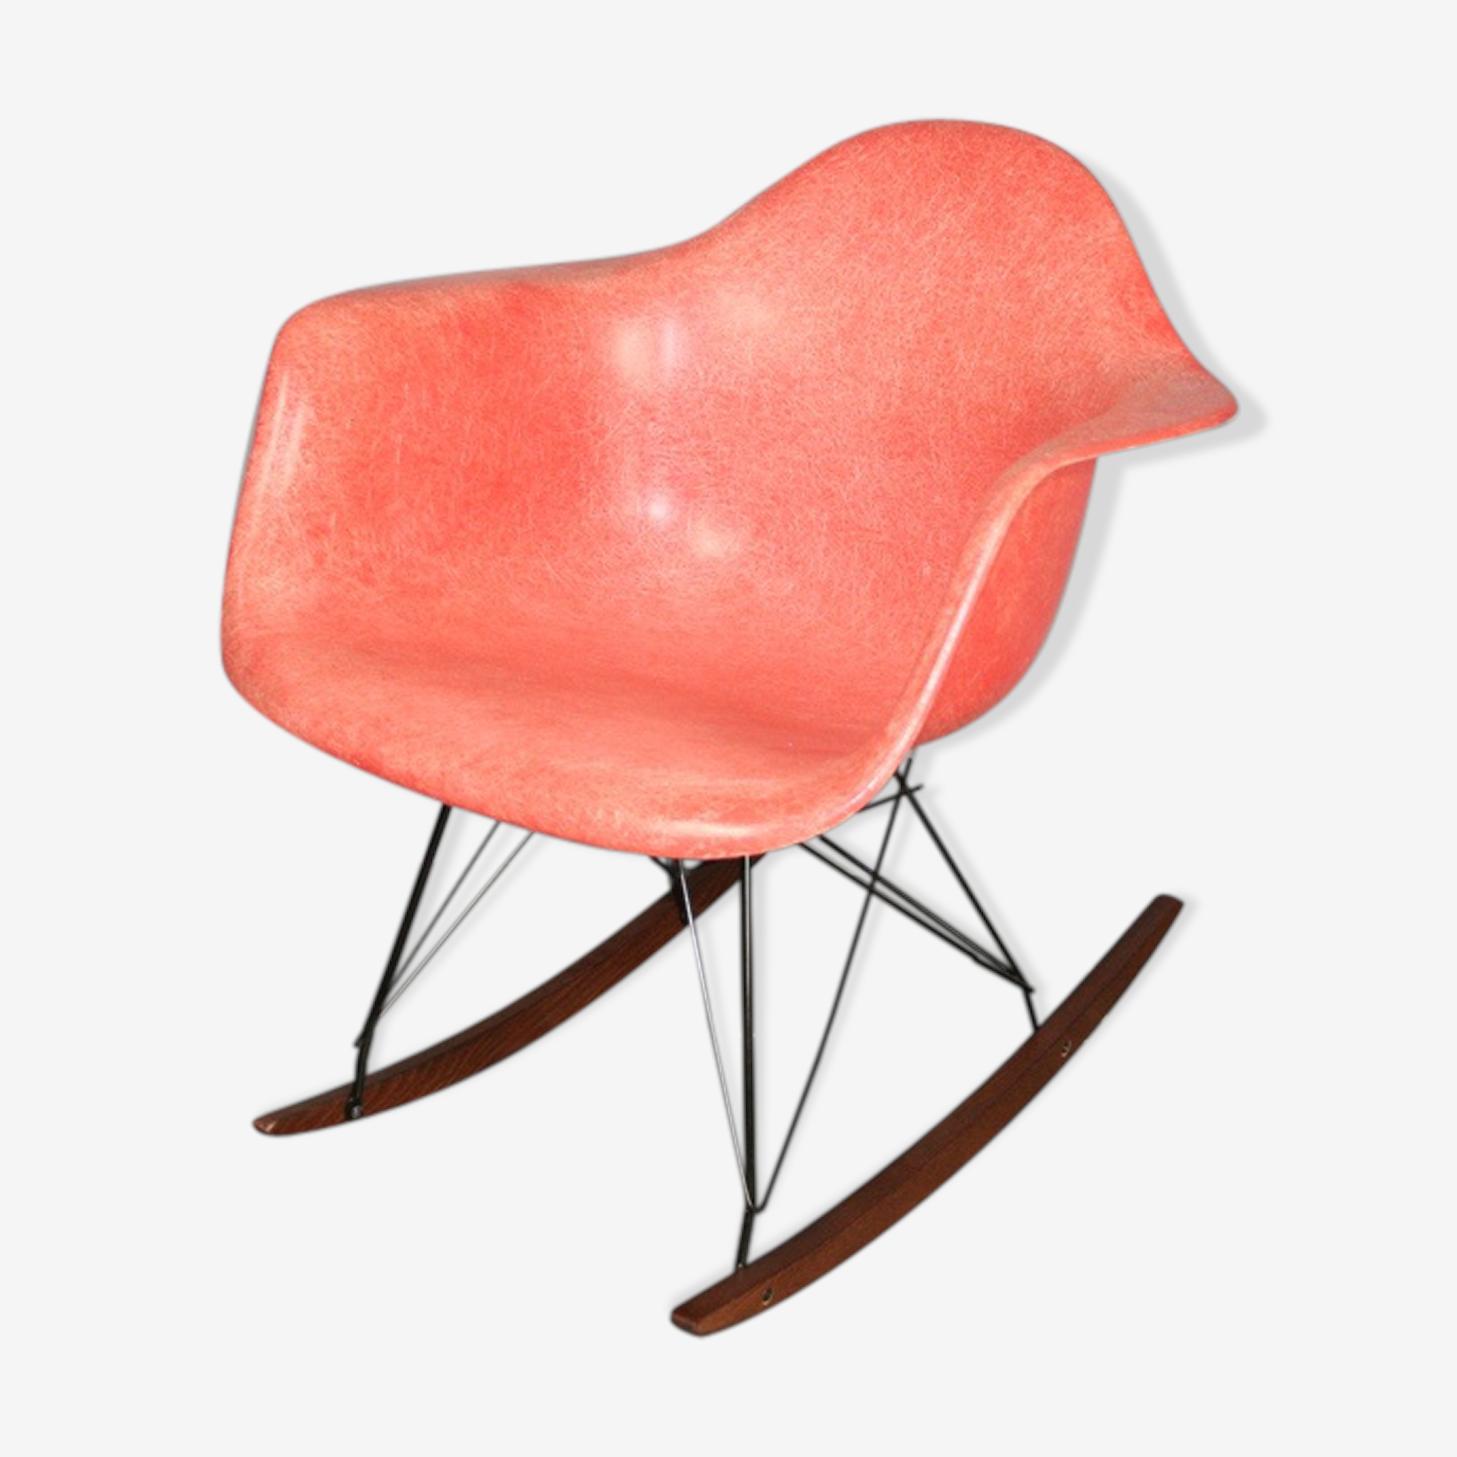 Summit plastic Herman Miller Eames rar Chair